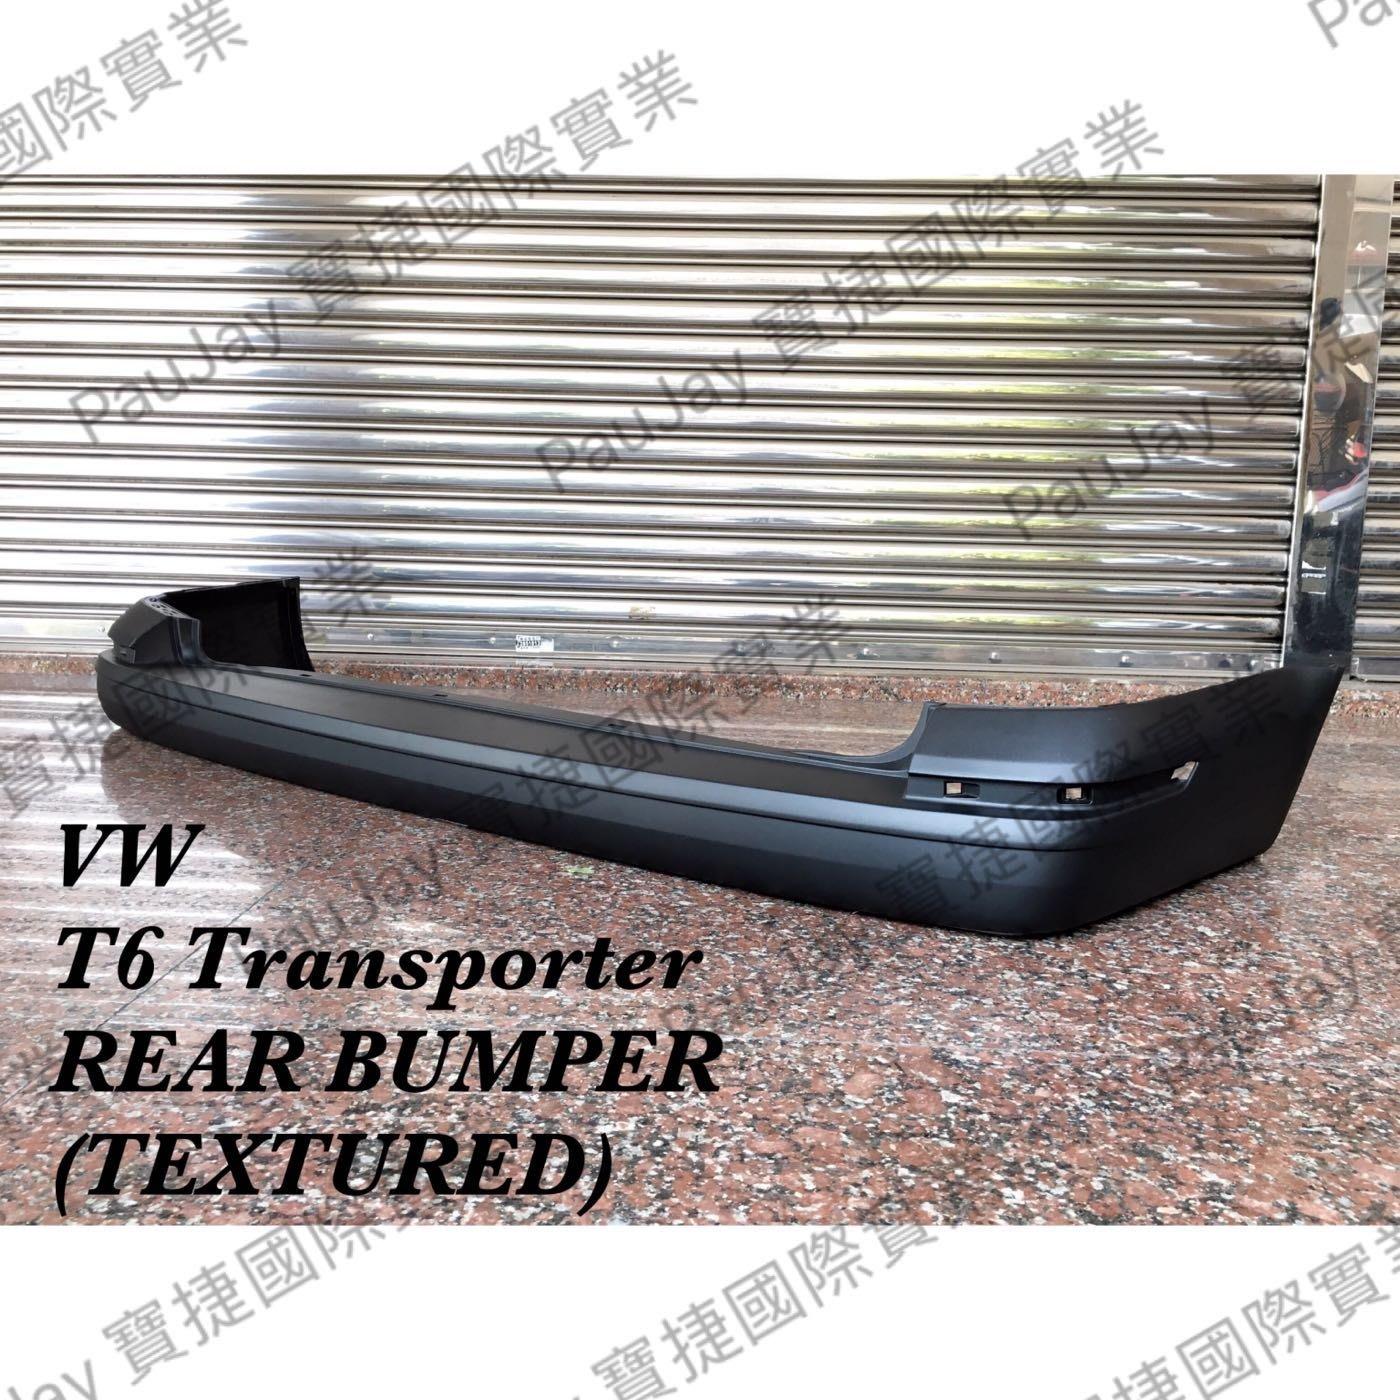 ※寶捷國際※【VS06501BA】2016 VW T6 Transporter 後保桿 7E0807417C9B9